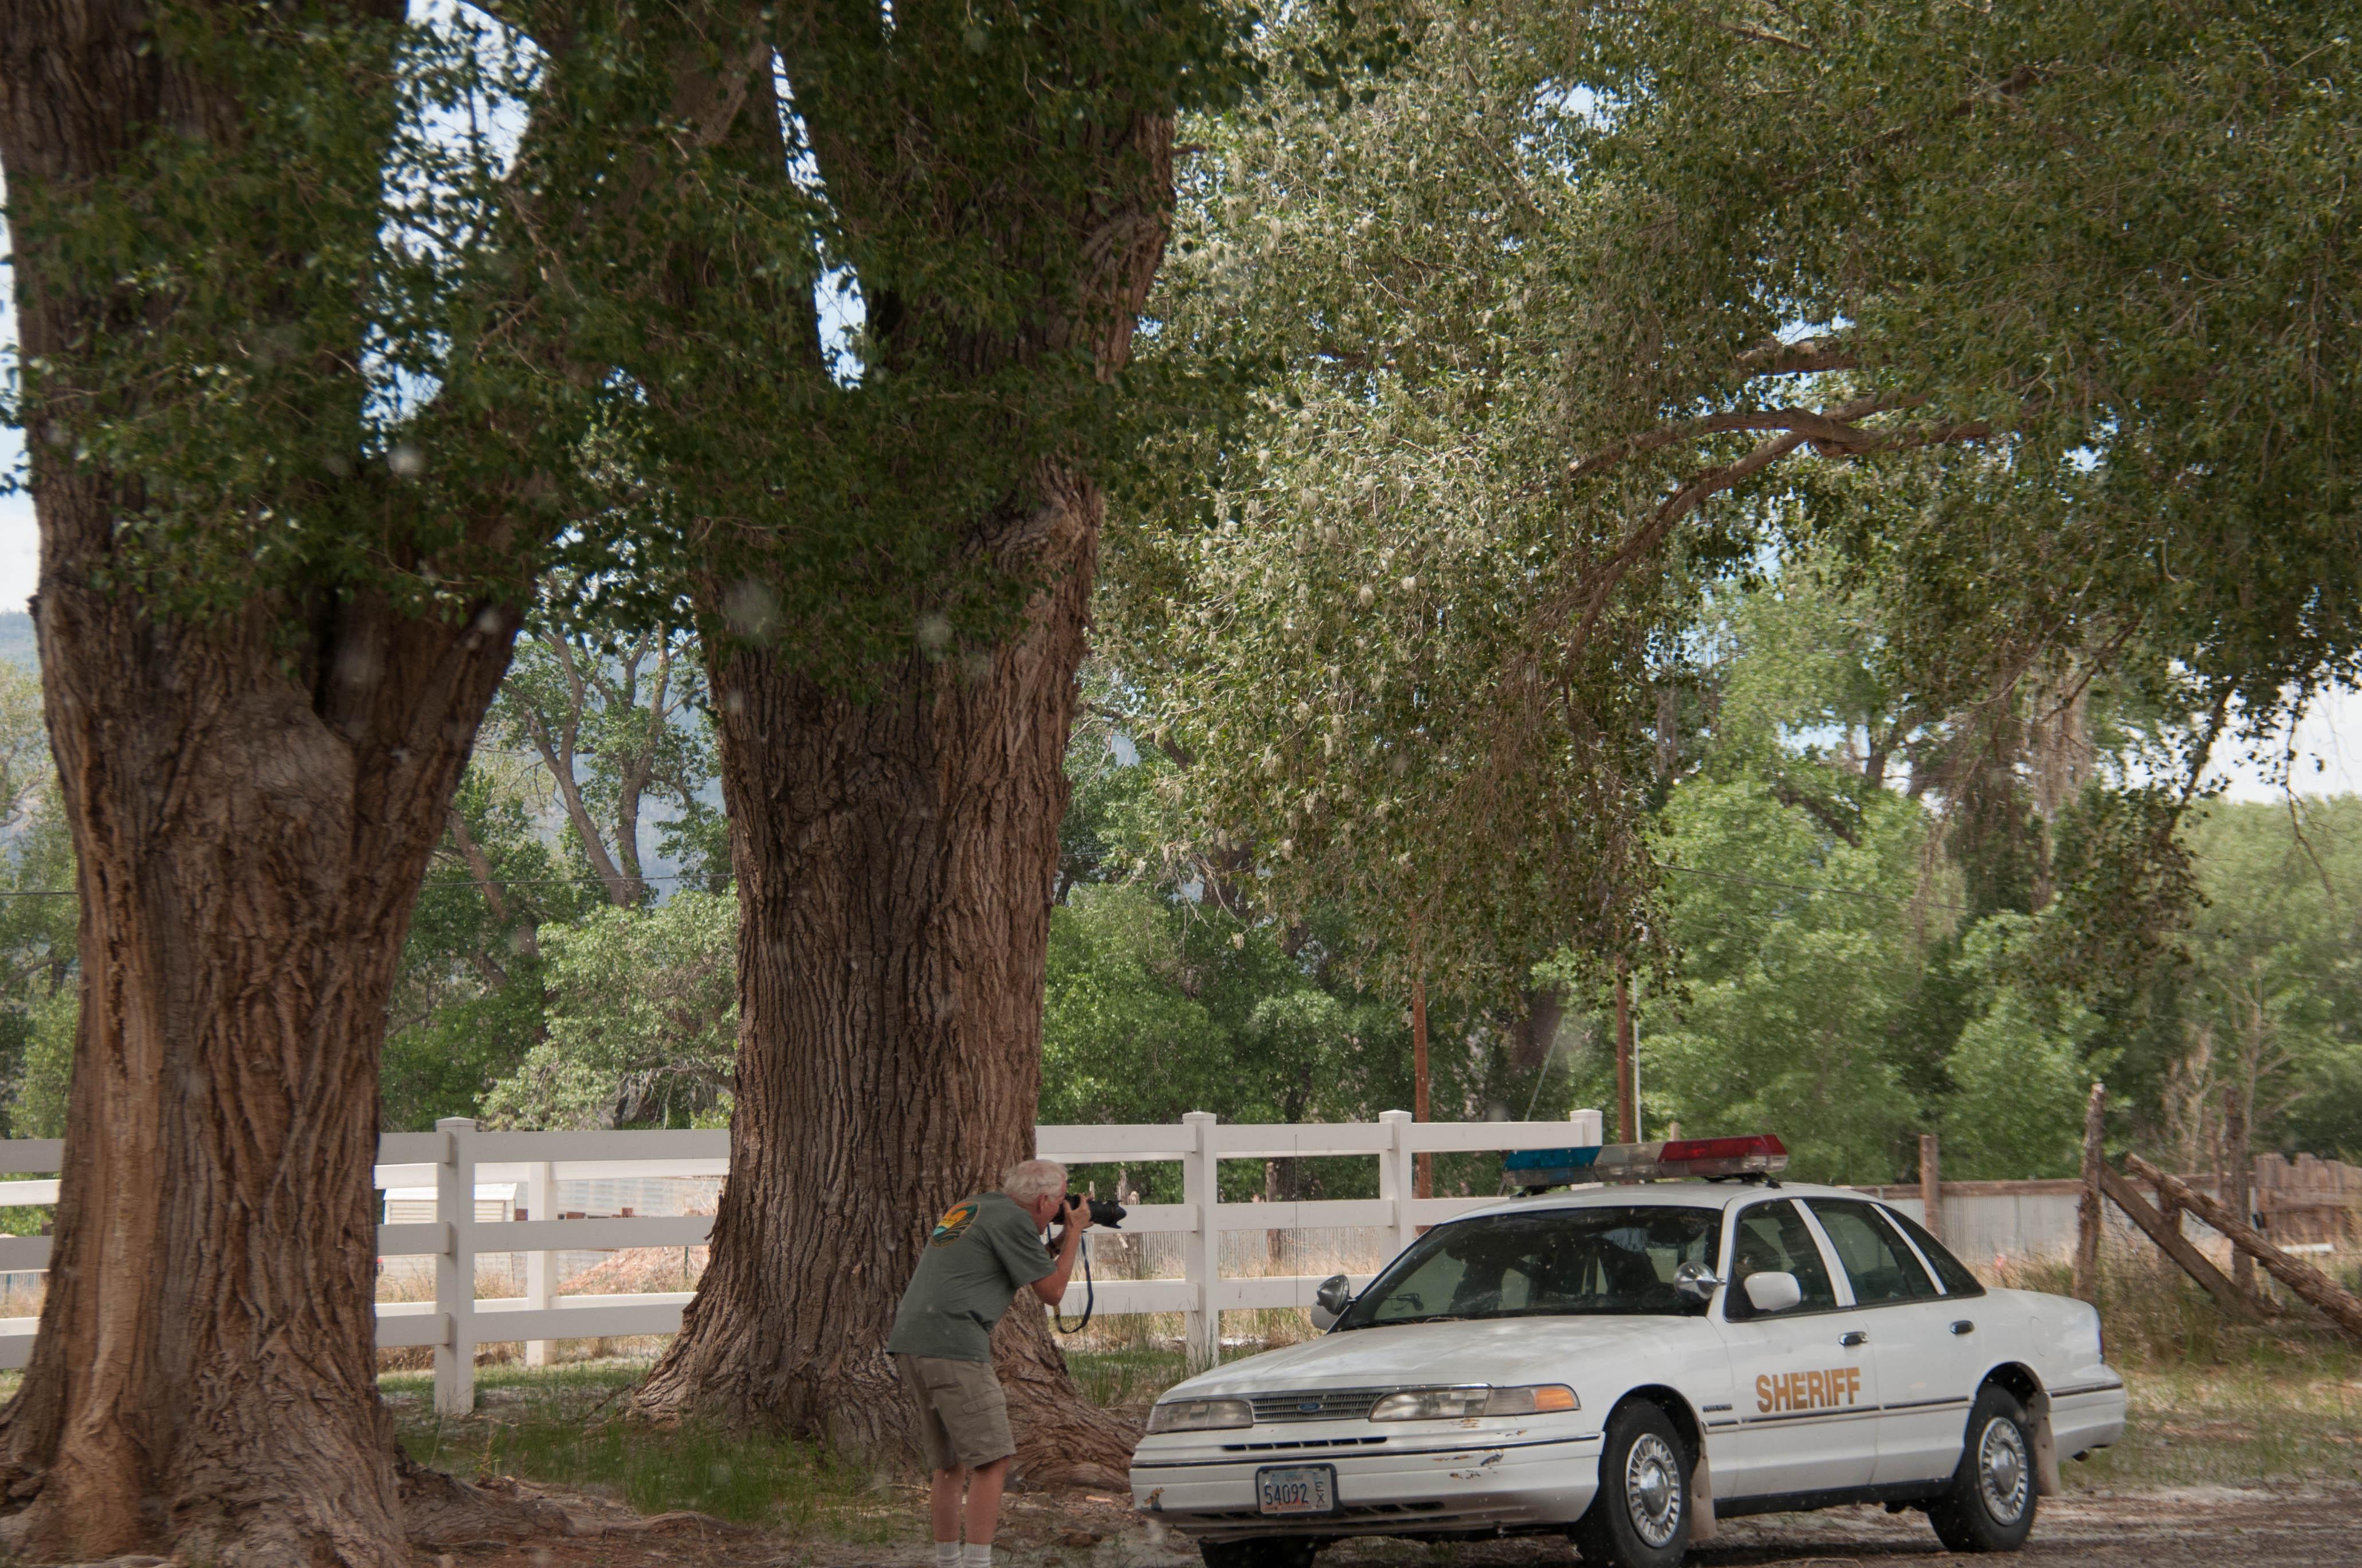 Sheriff's car reminder to slow down, Torrey, Utah, June 2016 | Photo by Kathy Lillywhite, St. George News